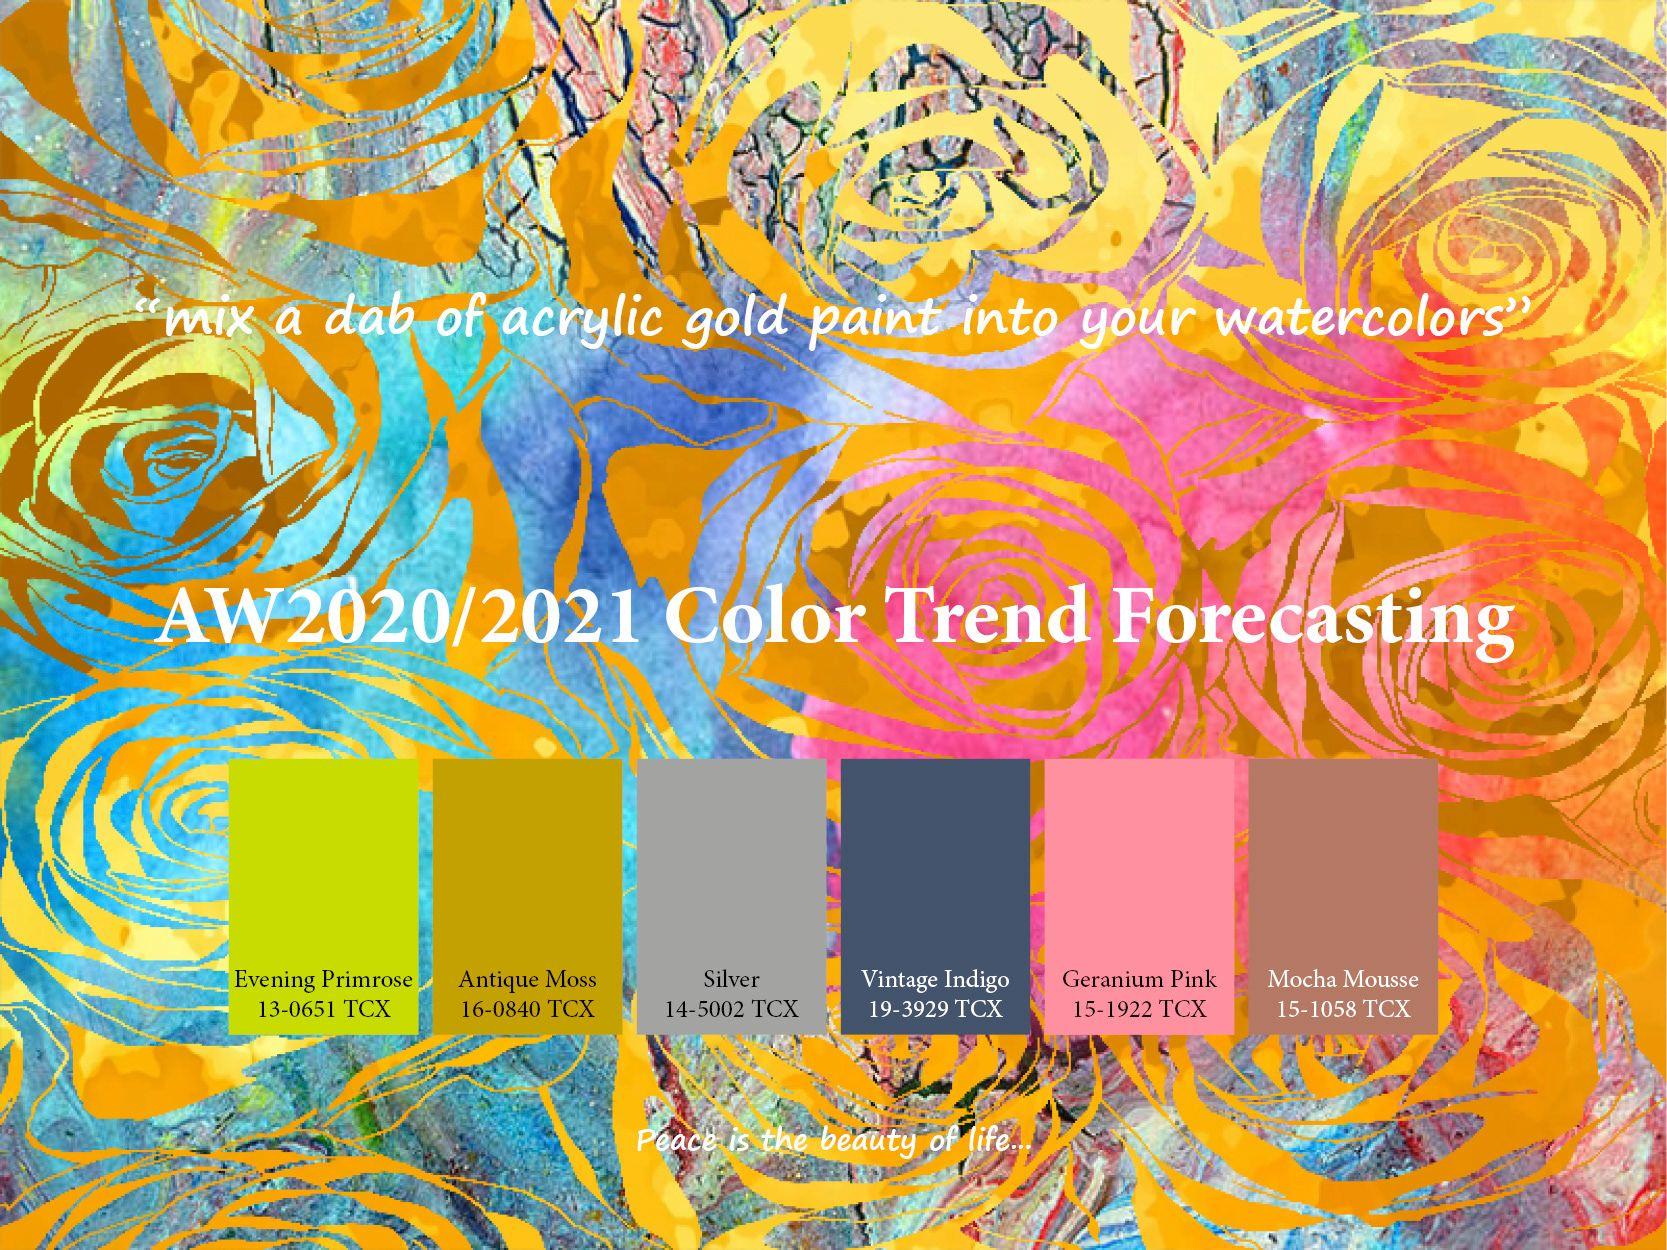 Fashion Web Graphic design and development. FashionWebGraphic@gmail.com 647 996 7071 - AW2020/2021 Trend forecasting